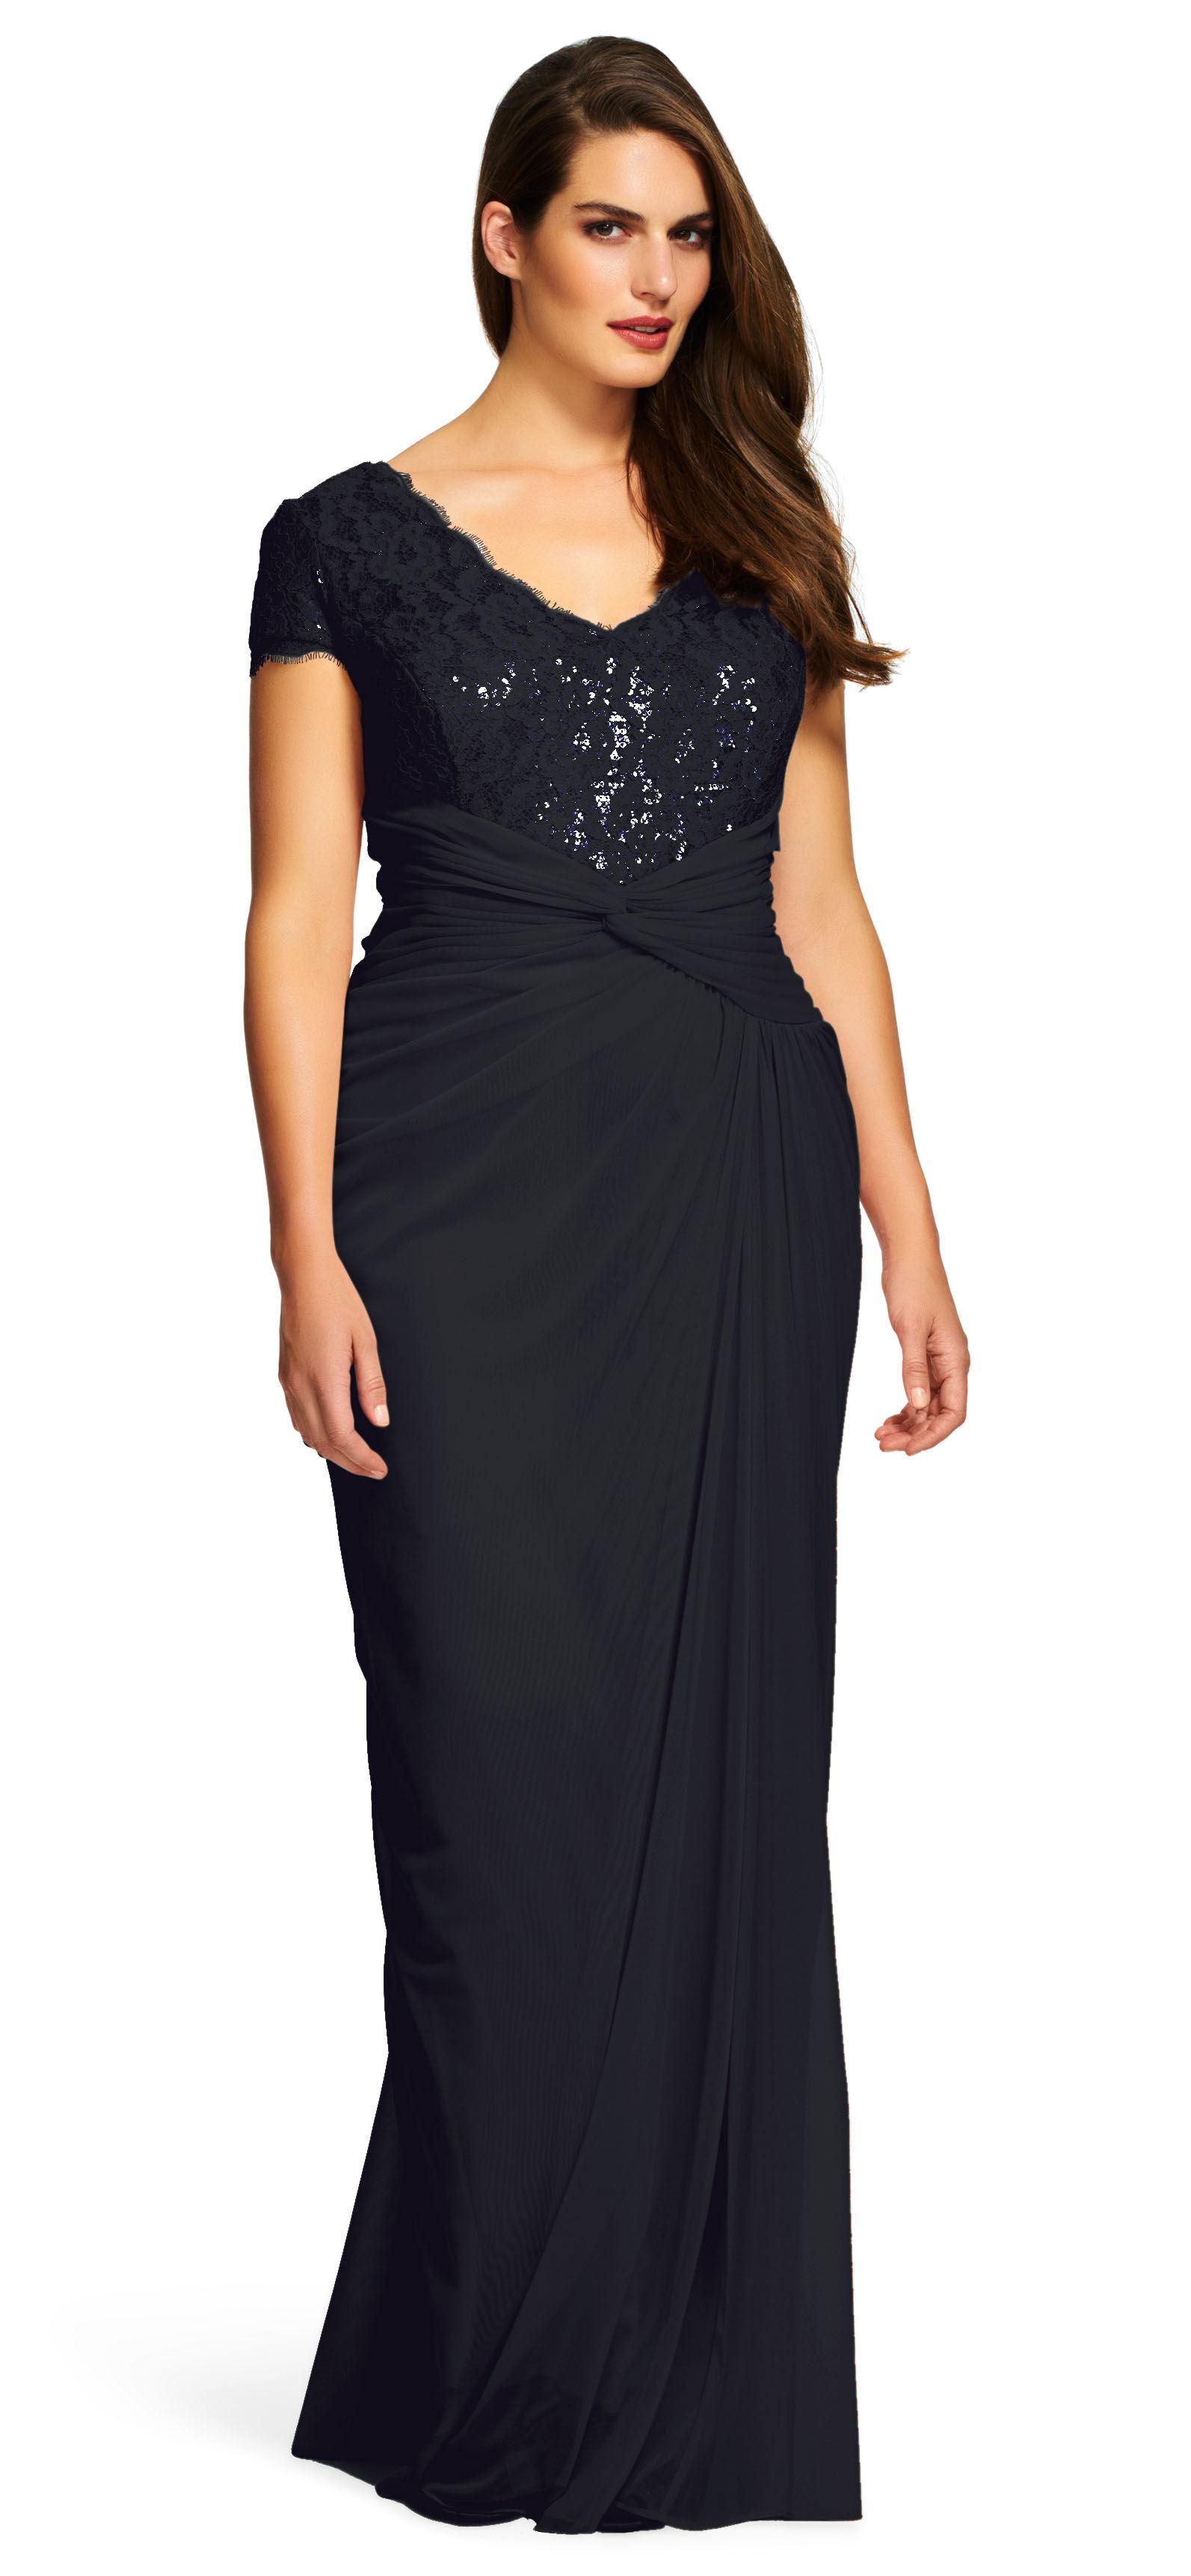 Long dress or short dress 30s